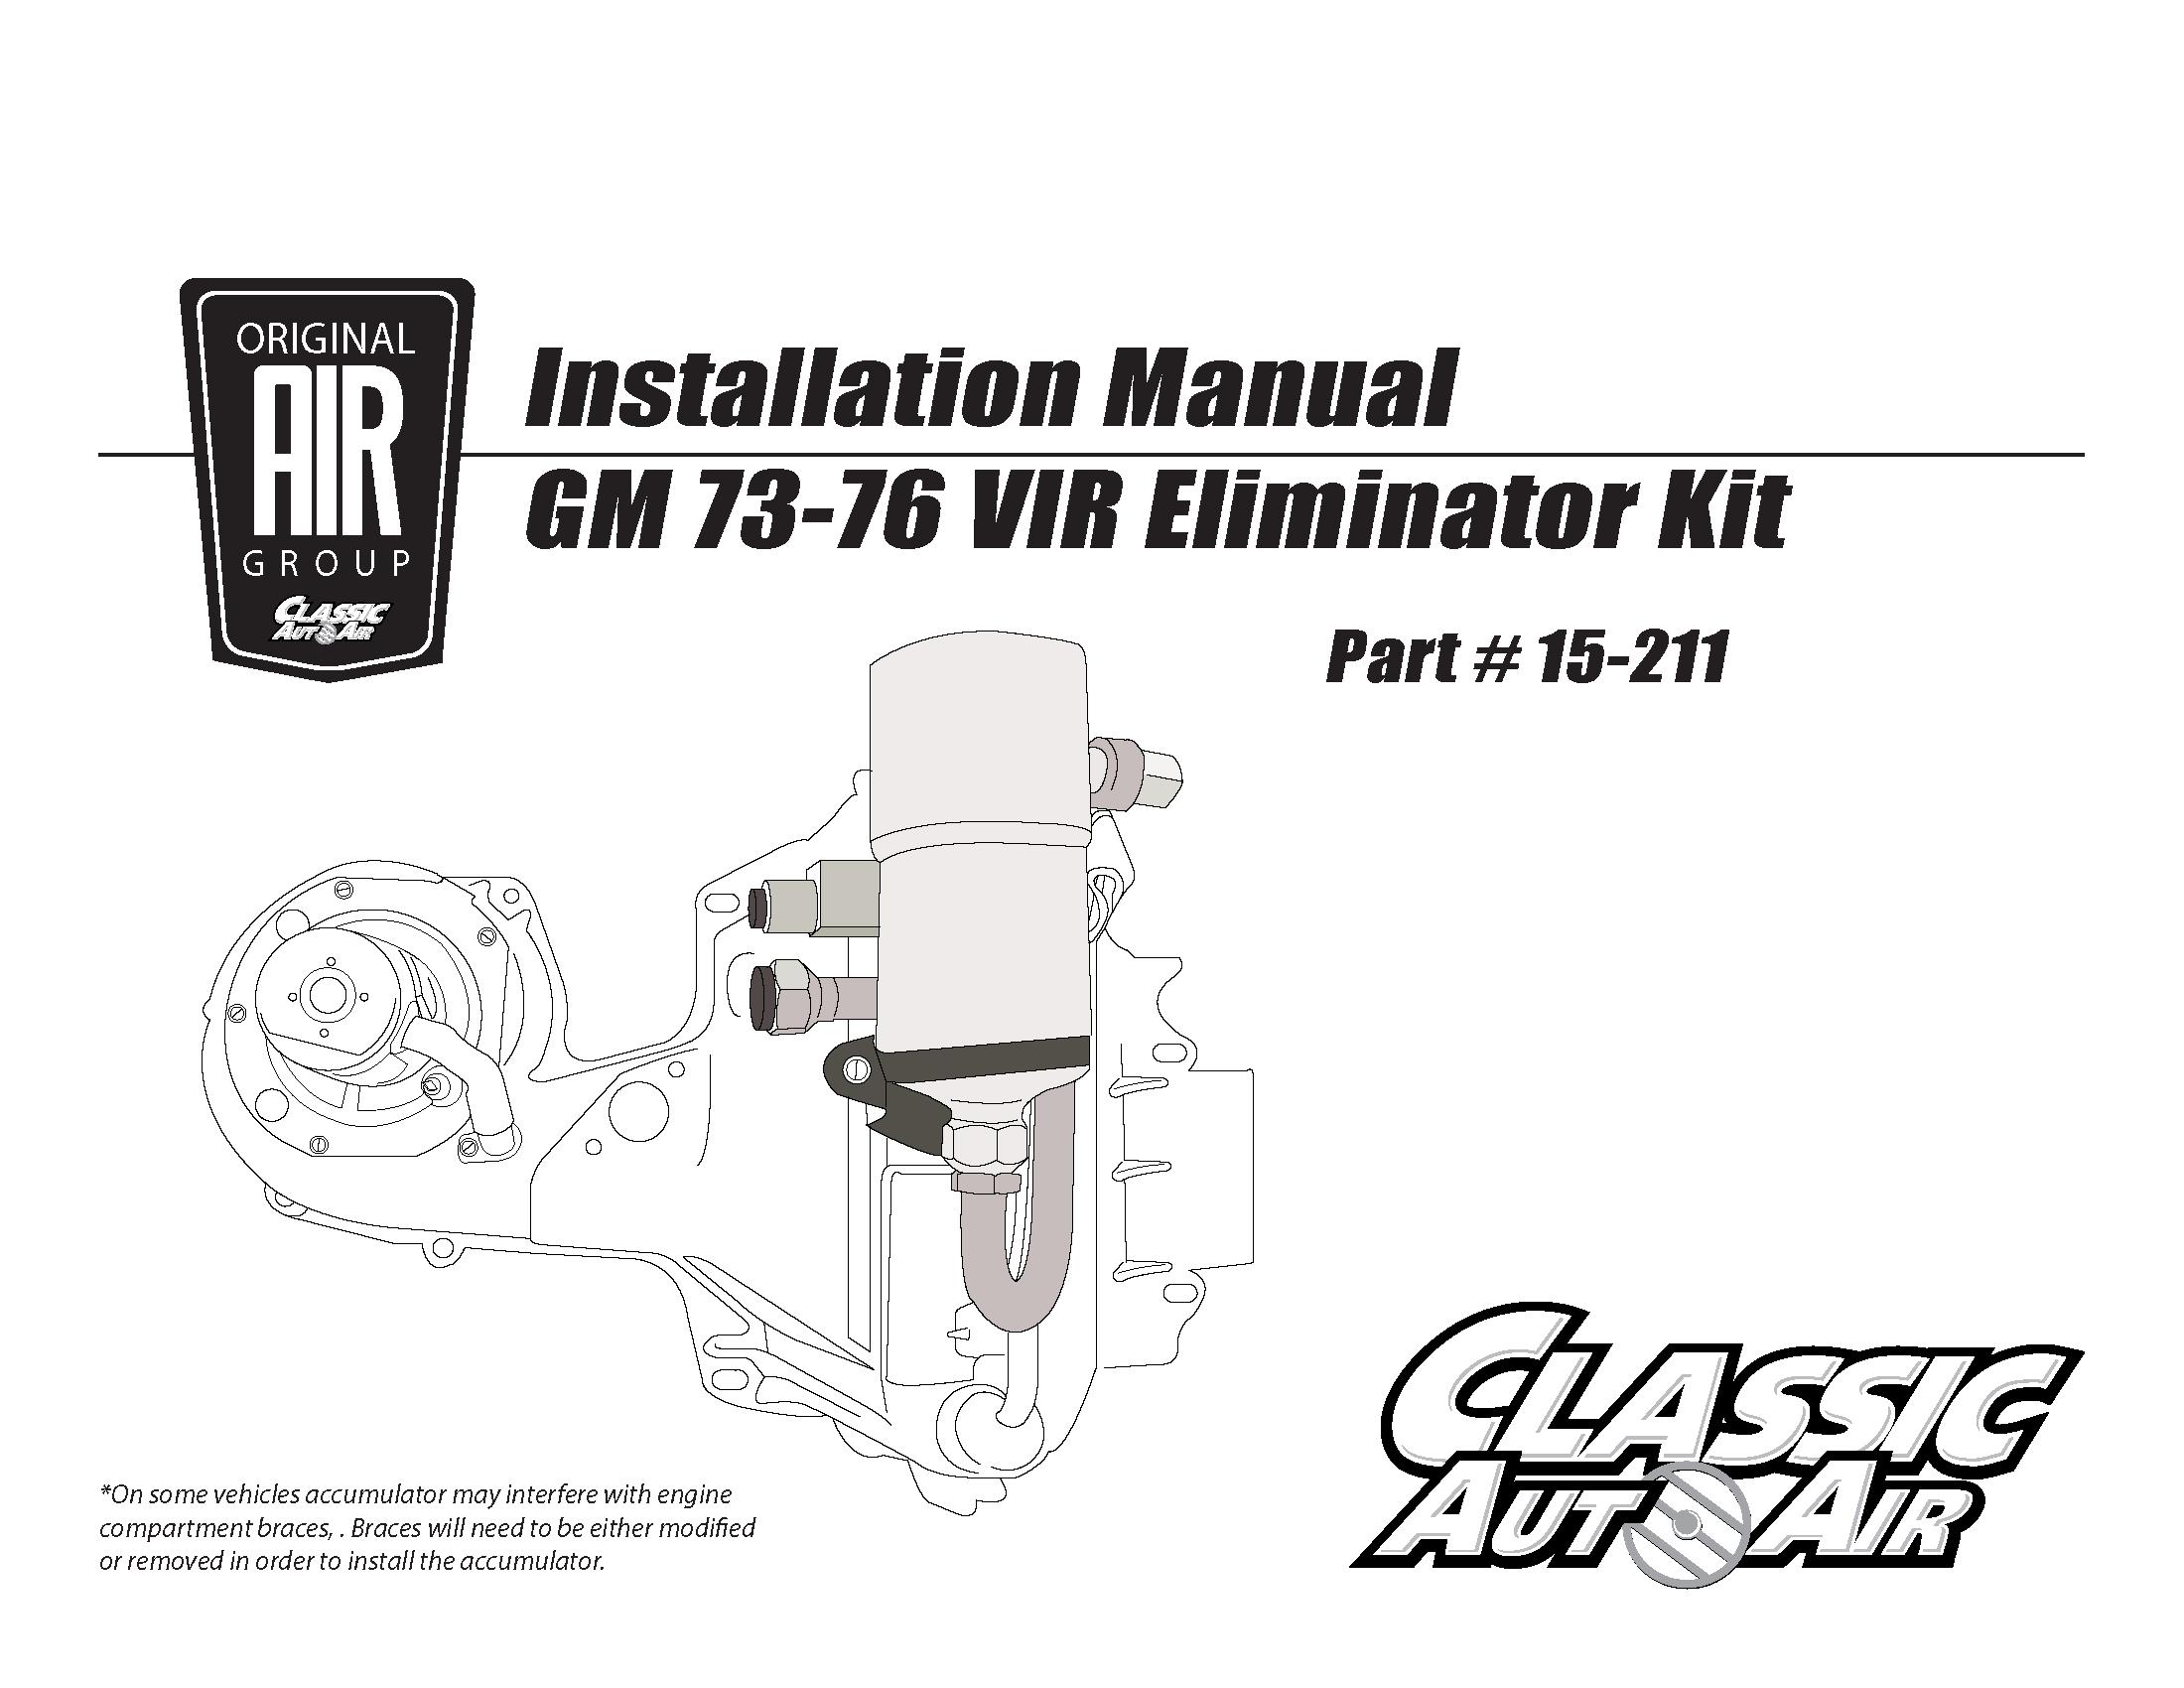 73-76 GM A/C VIR Eliminator Kit   Original Air Group